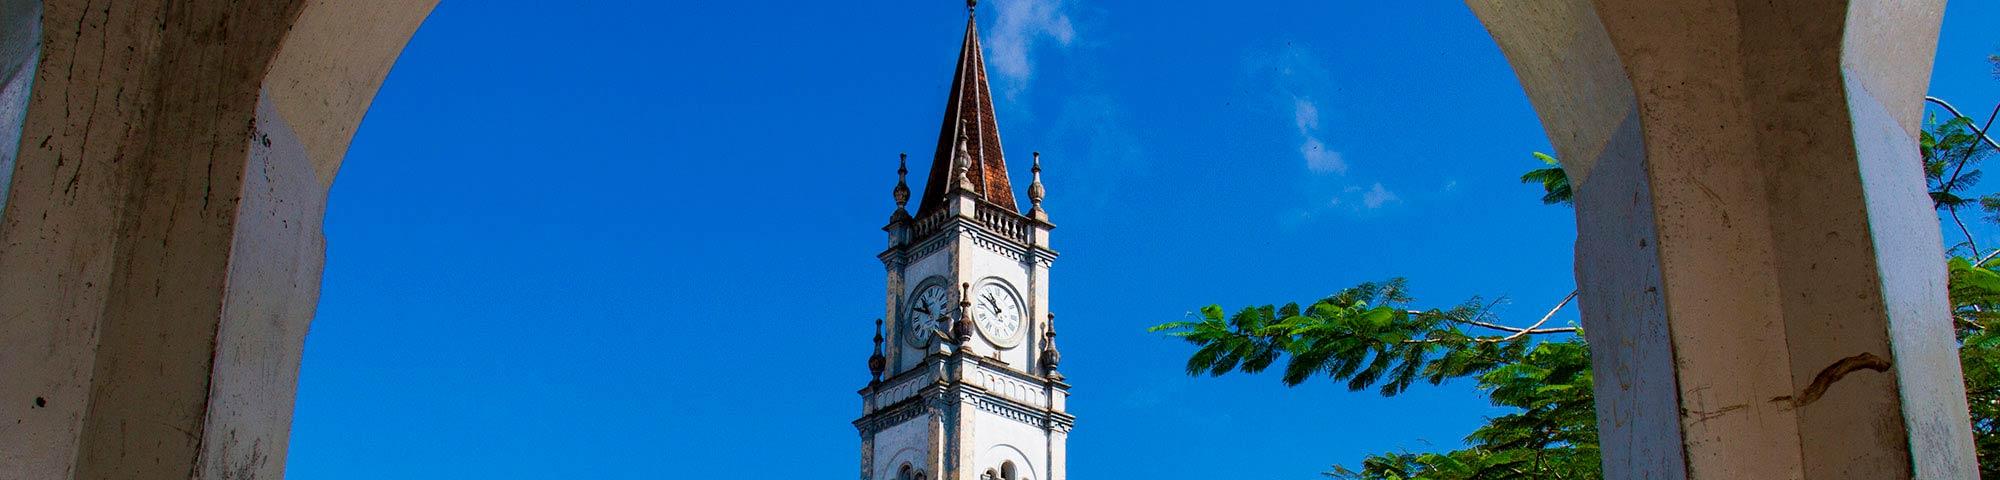 Templo Virgen de Las Nieves – Catedral de Yurimaguas